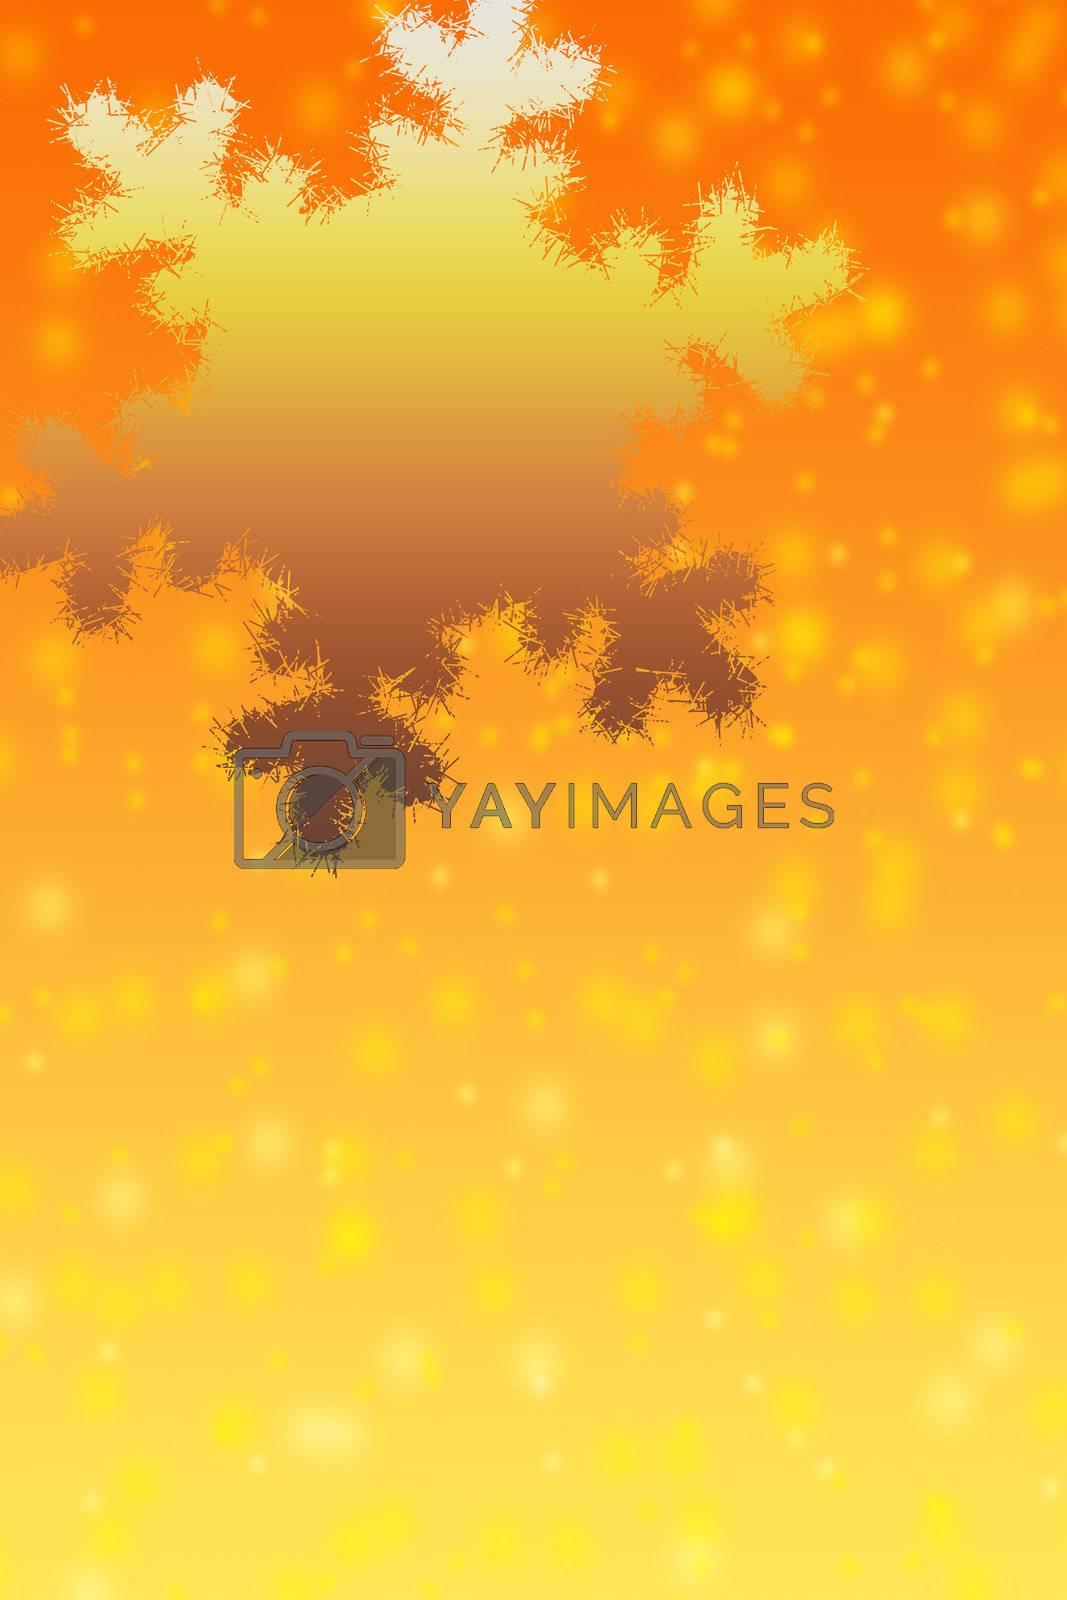 Christmas snowflake on an orange background. The big snowflake